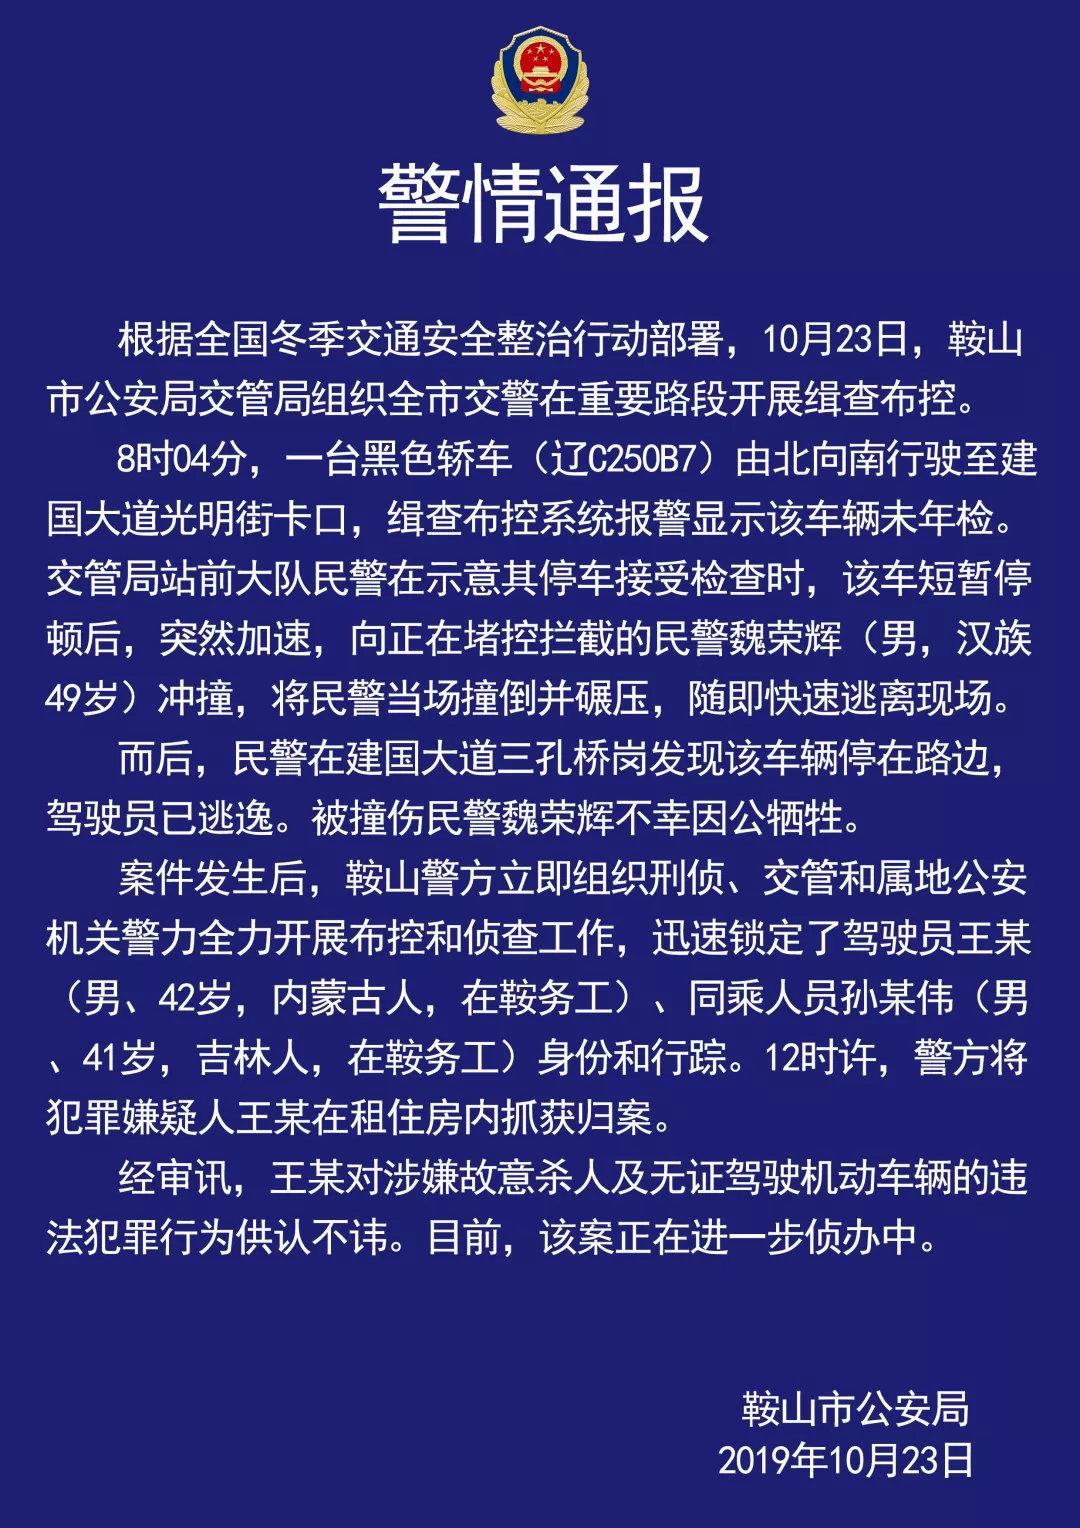 http://www.1560327.live/caijingfenxi/47293.html